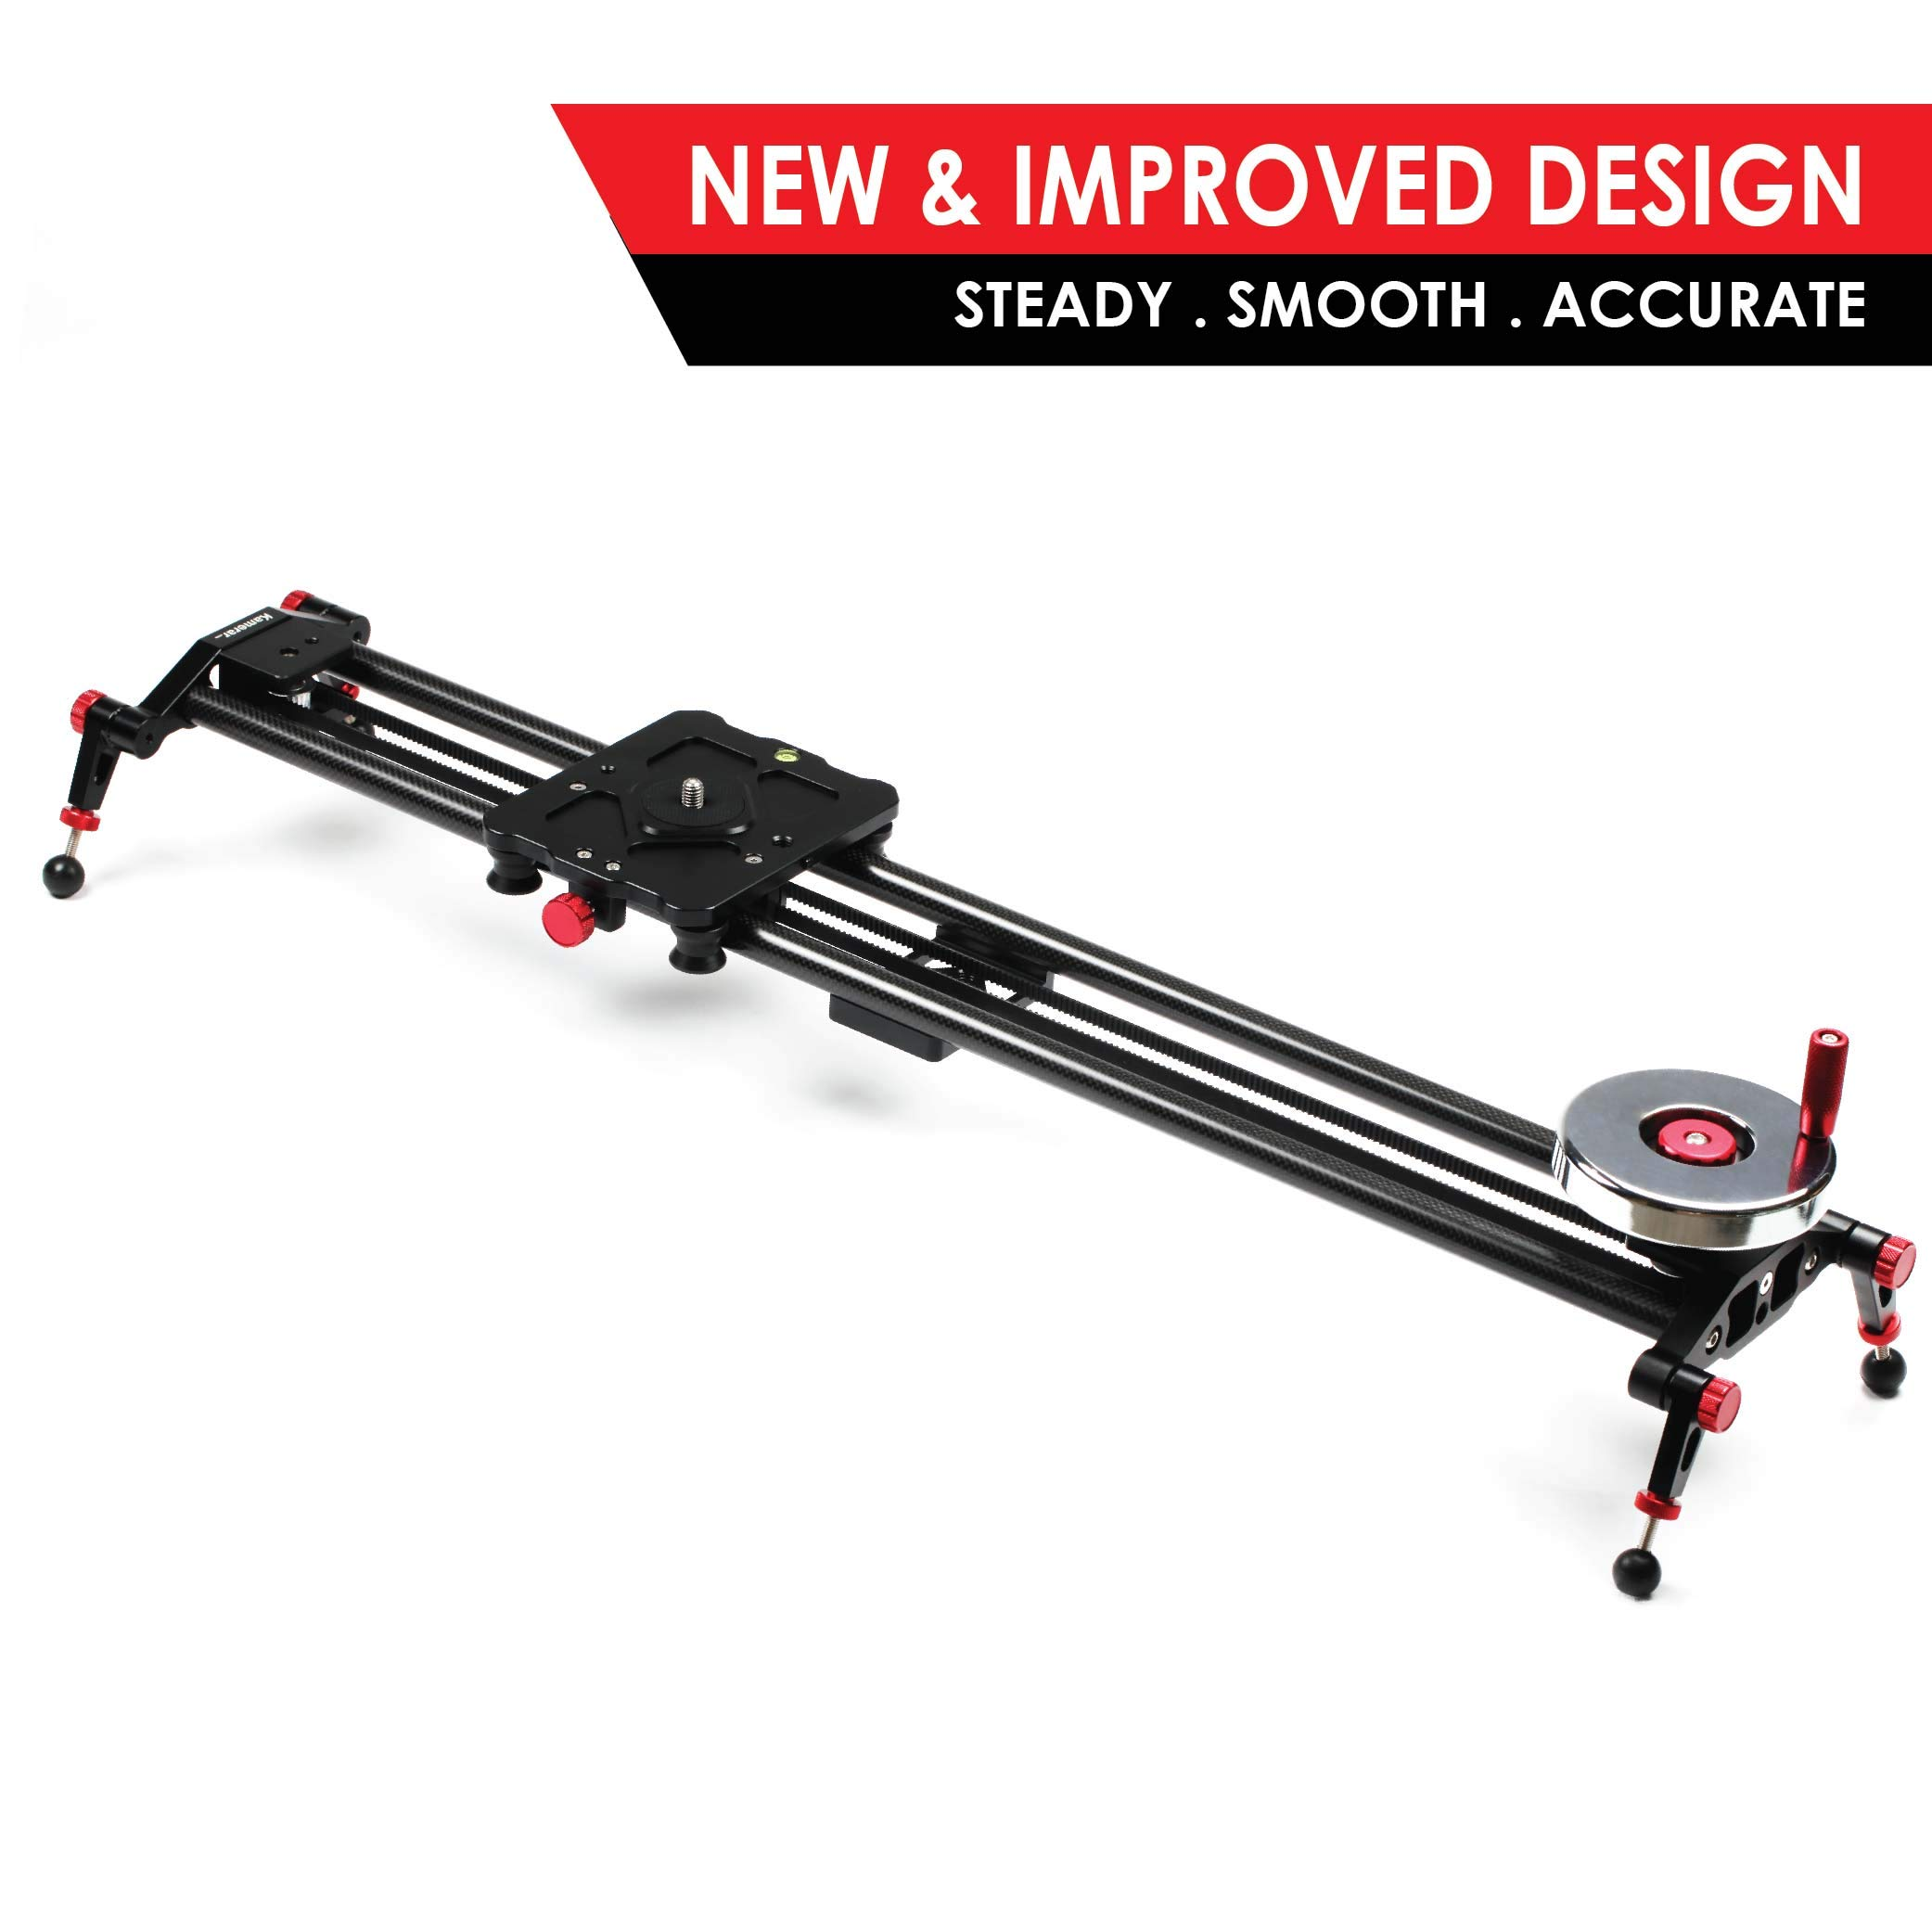 Kamerar 31'' Fluid Motion Video Slider: flywheel, counterweight, light carbon fiber rails, adjustable legs, dslr camera/camcorder stabilization track, tripod mount ready, stabilizer for filming by Kamerar